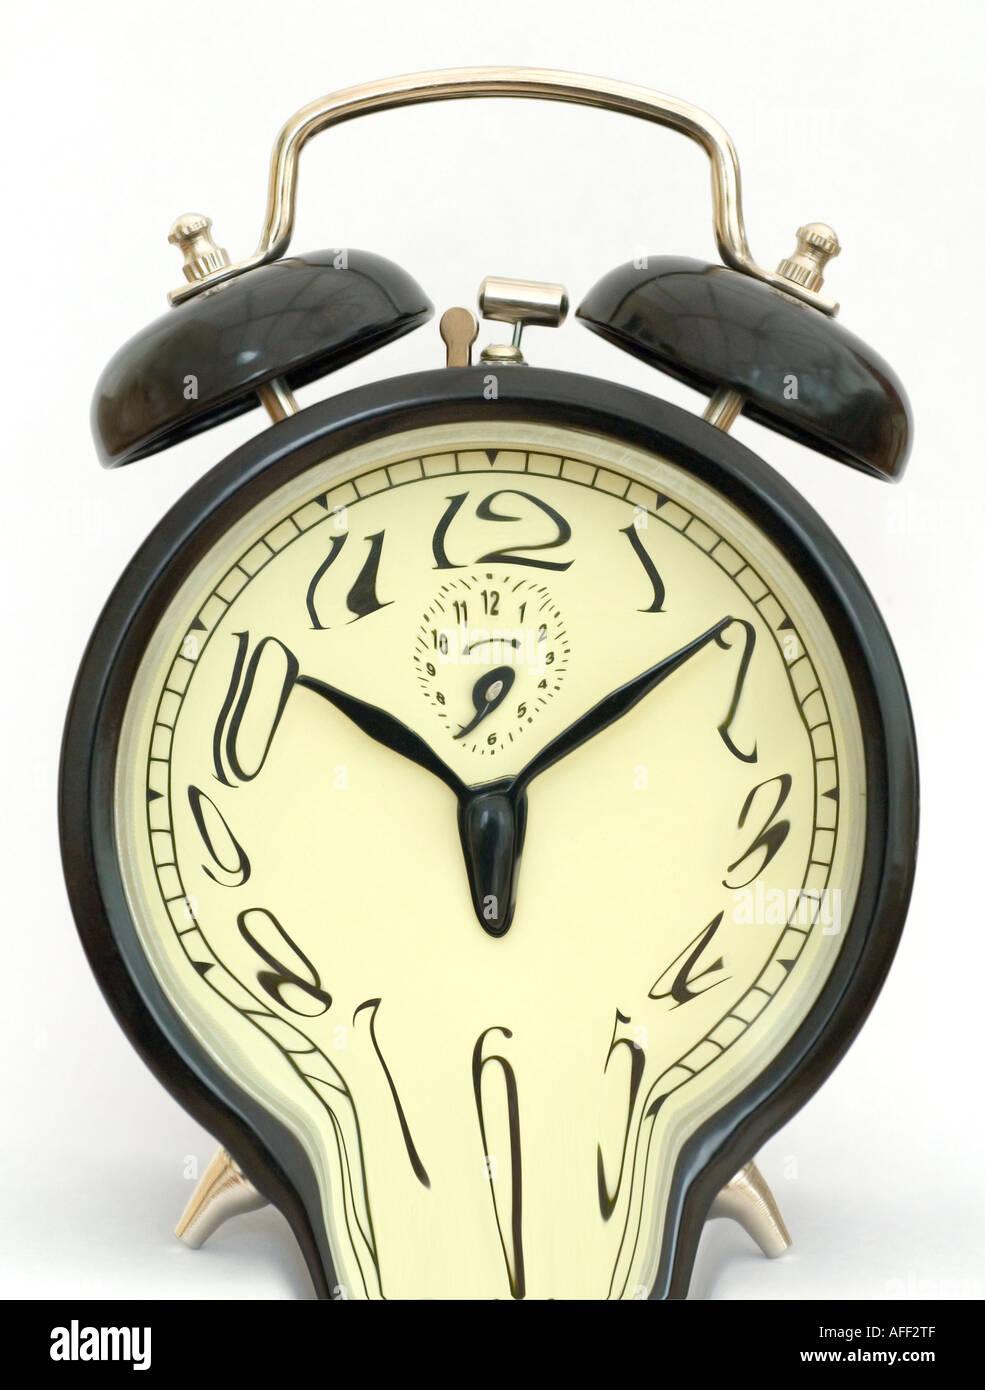 Time Slipping Away - Stock Image